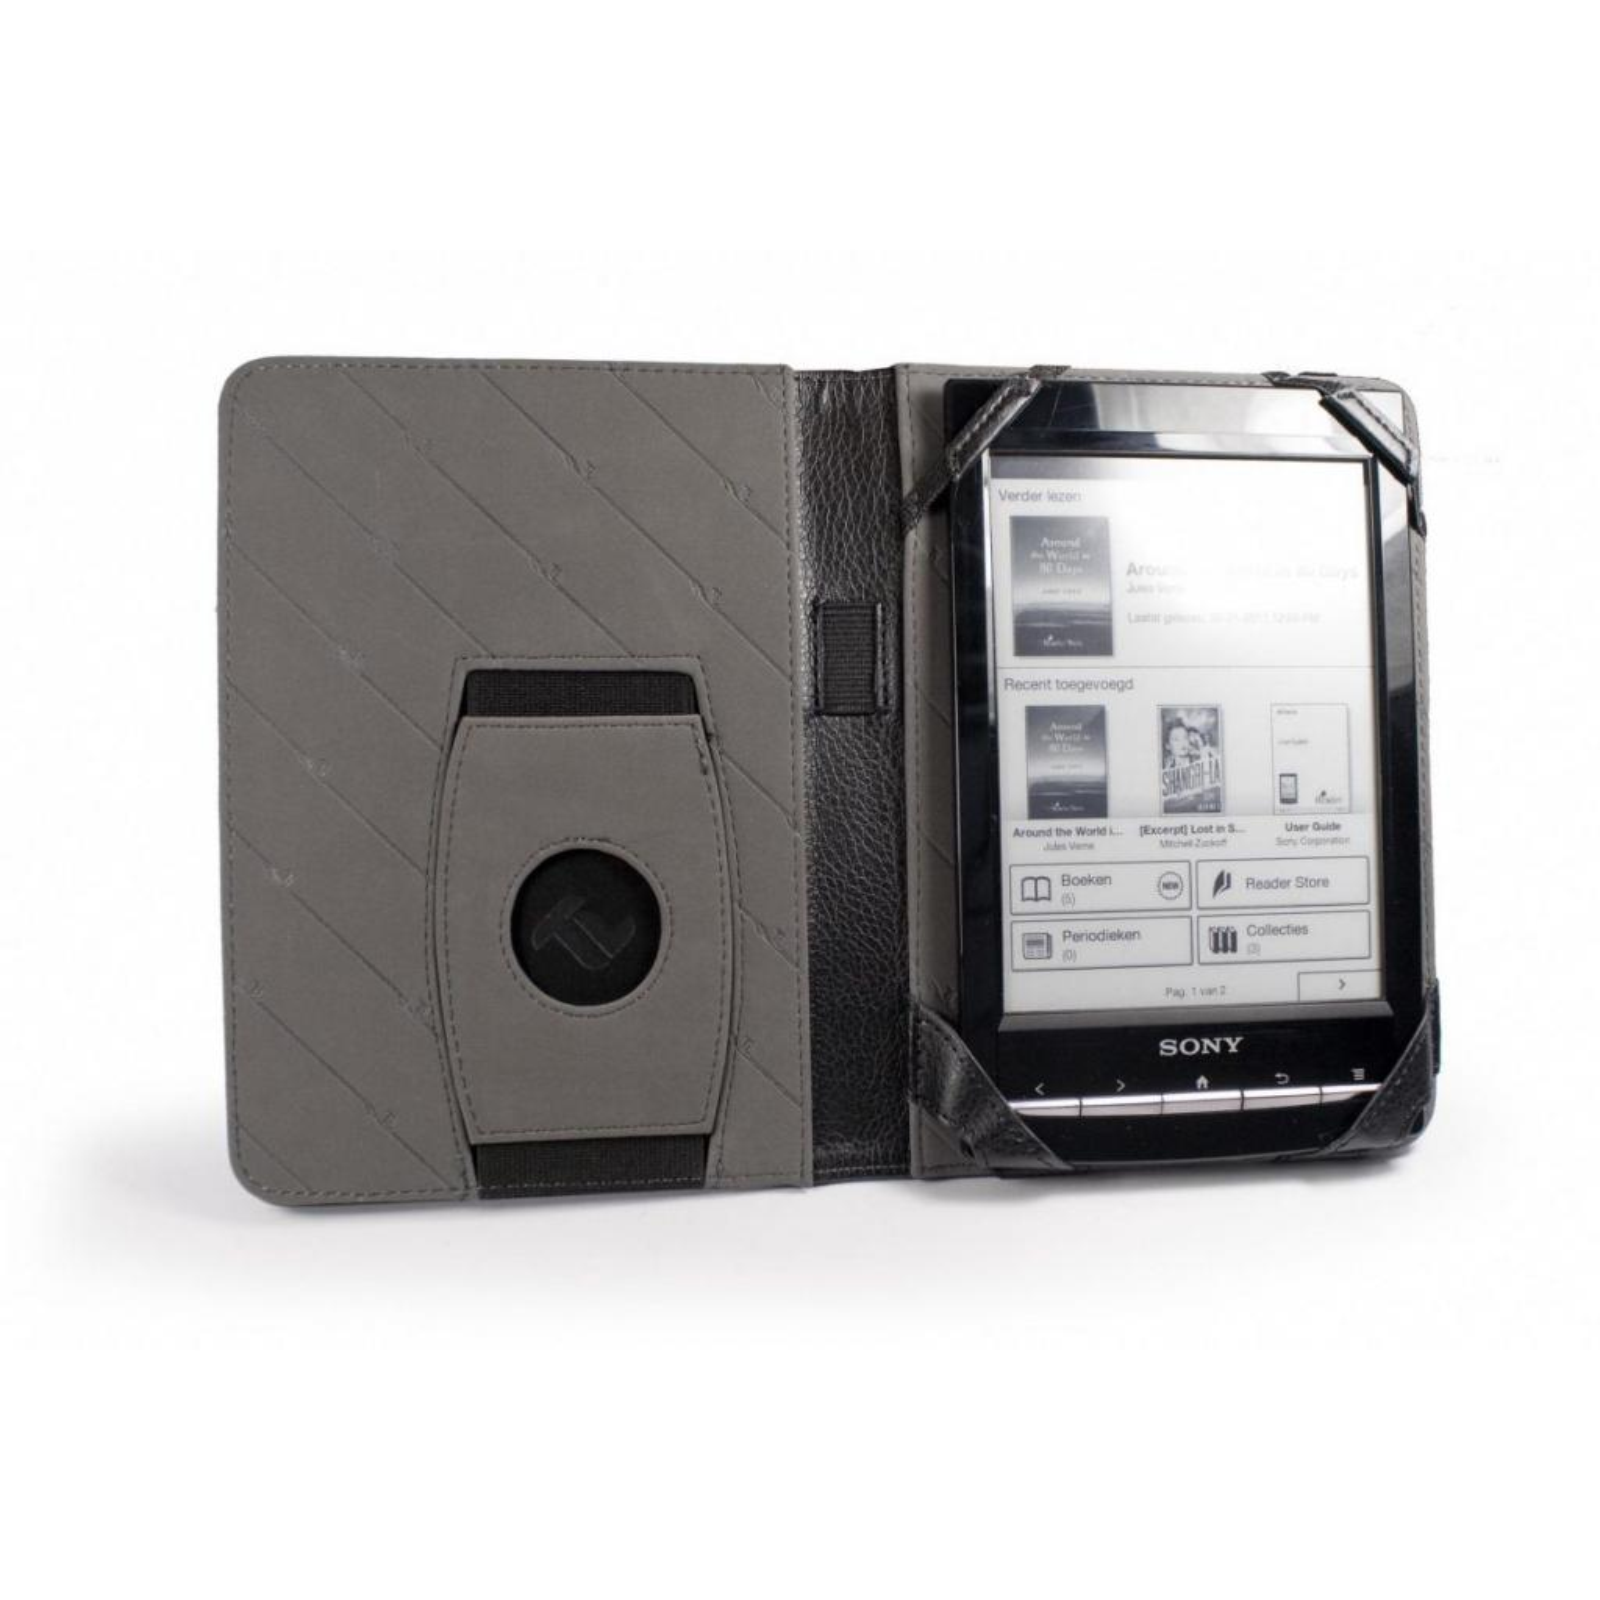 Чехол для электронной книги Tuff-Luv 6 Embrace faux leather/Black (C4_55) изображение 2